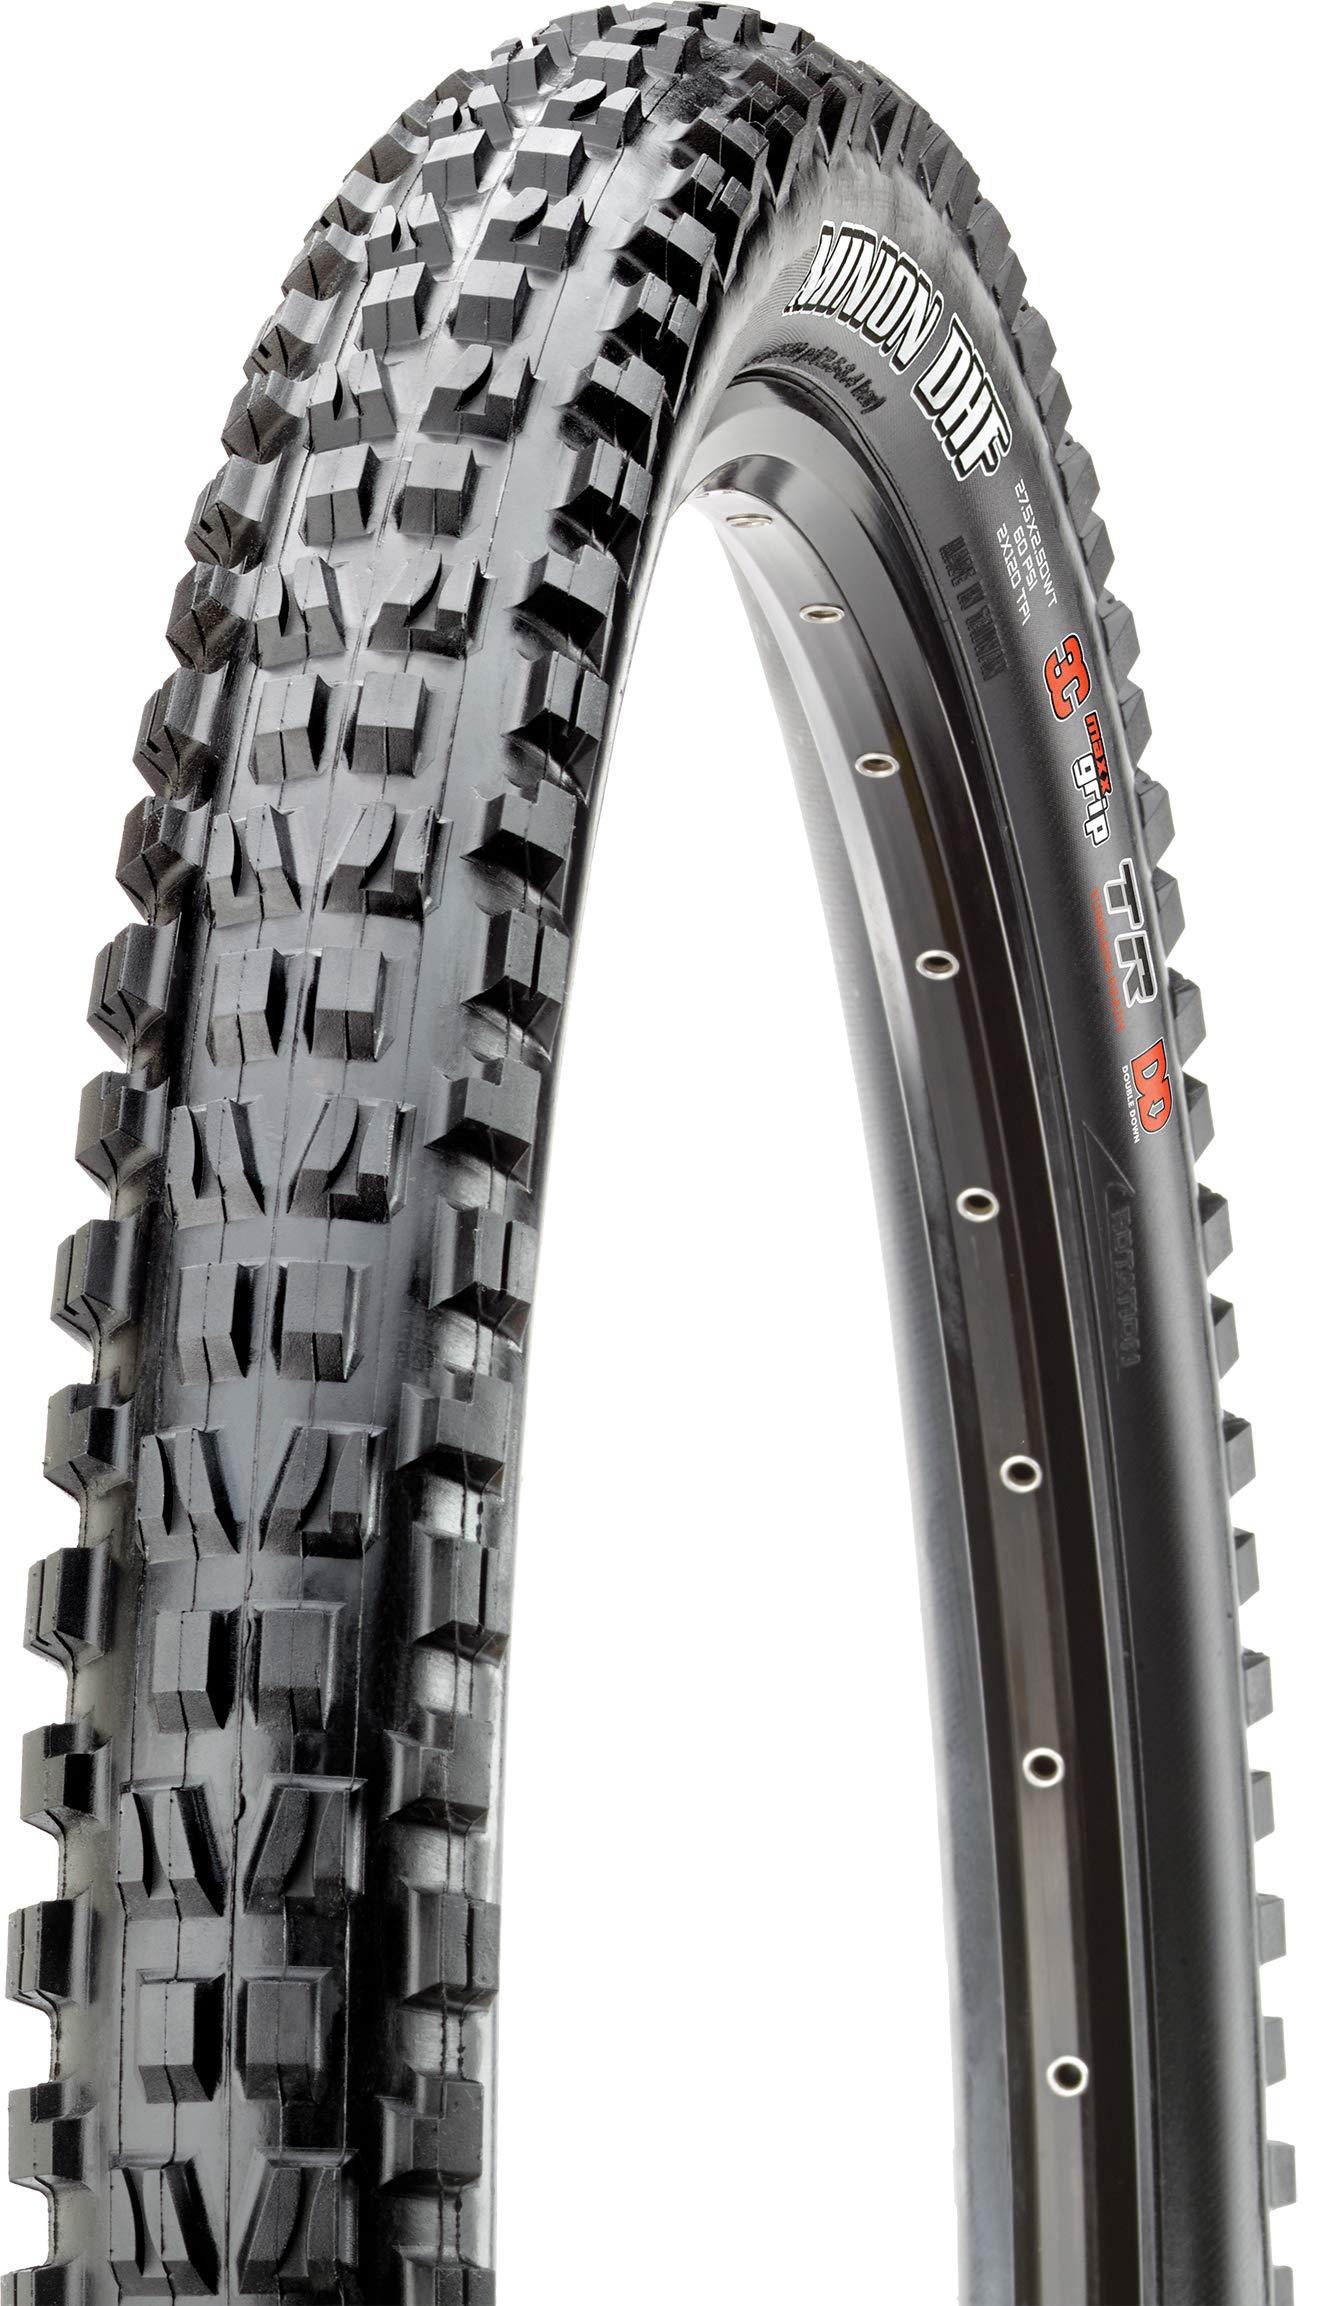 Best Rated in Bike Tires & Tubes & Helpful Customer Reviews